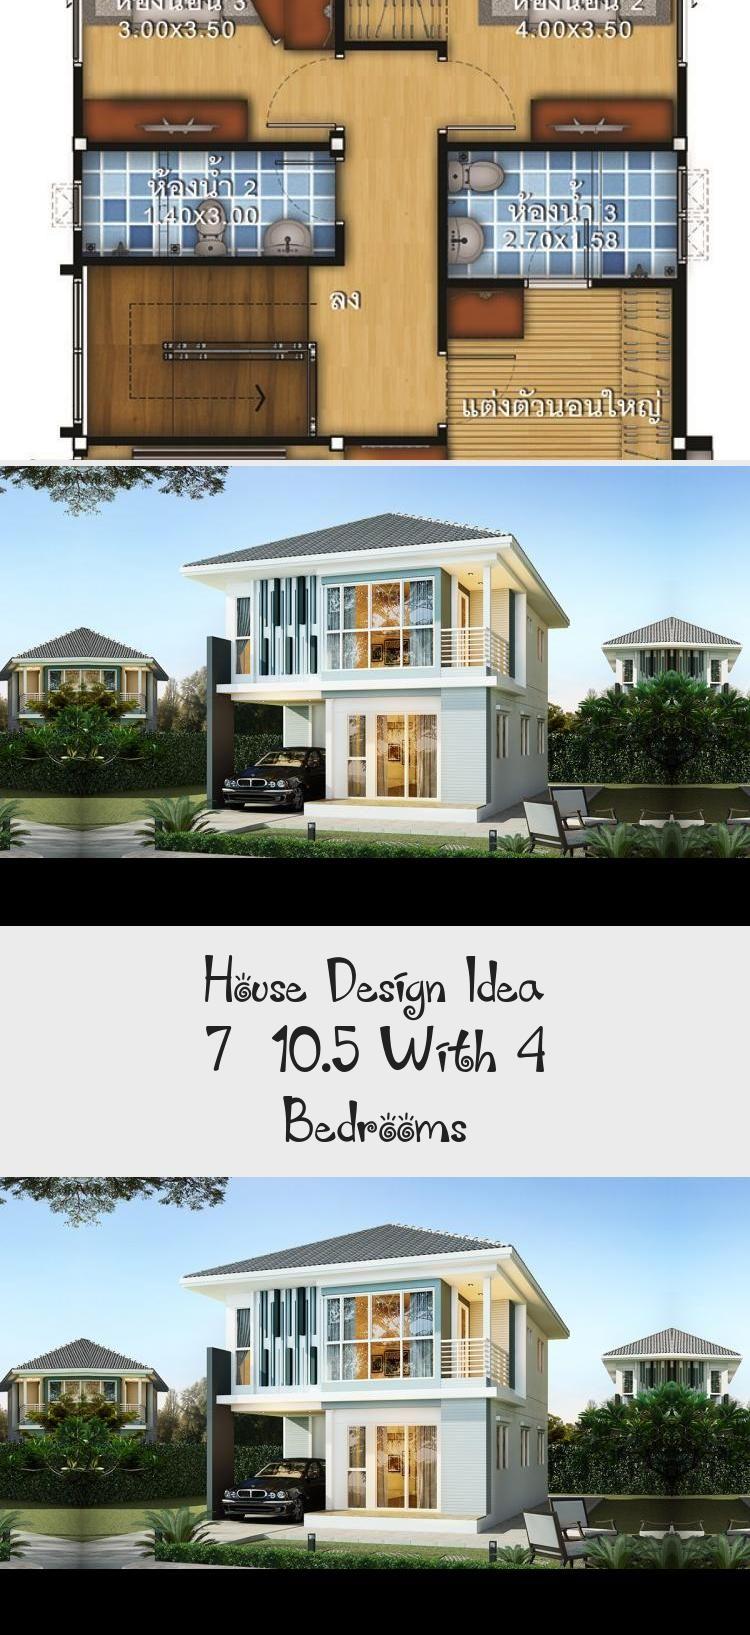 House Design Idea 7x10 5 With 4 Bedrooms Sam House Plans Smallhouseplansfarmhouse Uniquesmallho In 2020 Courtyard House Plans House Design Unique Small House Plans